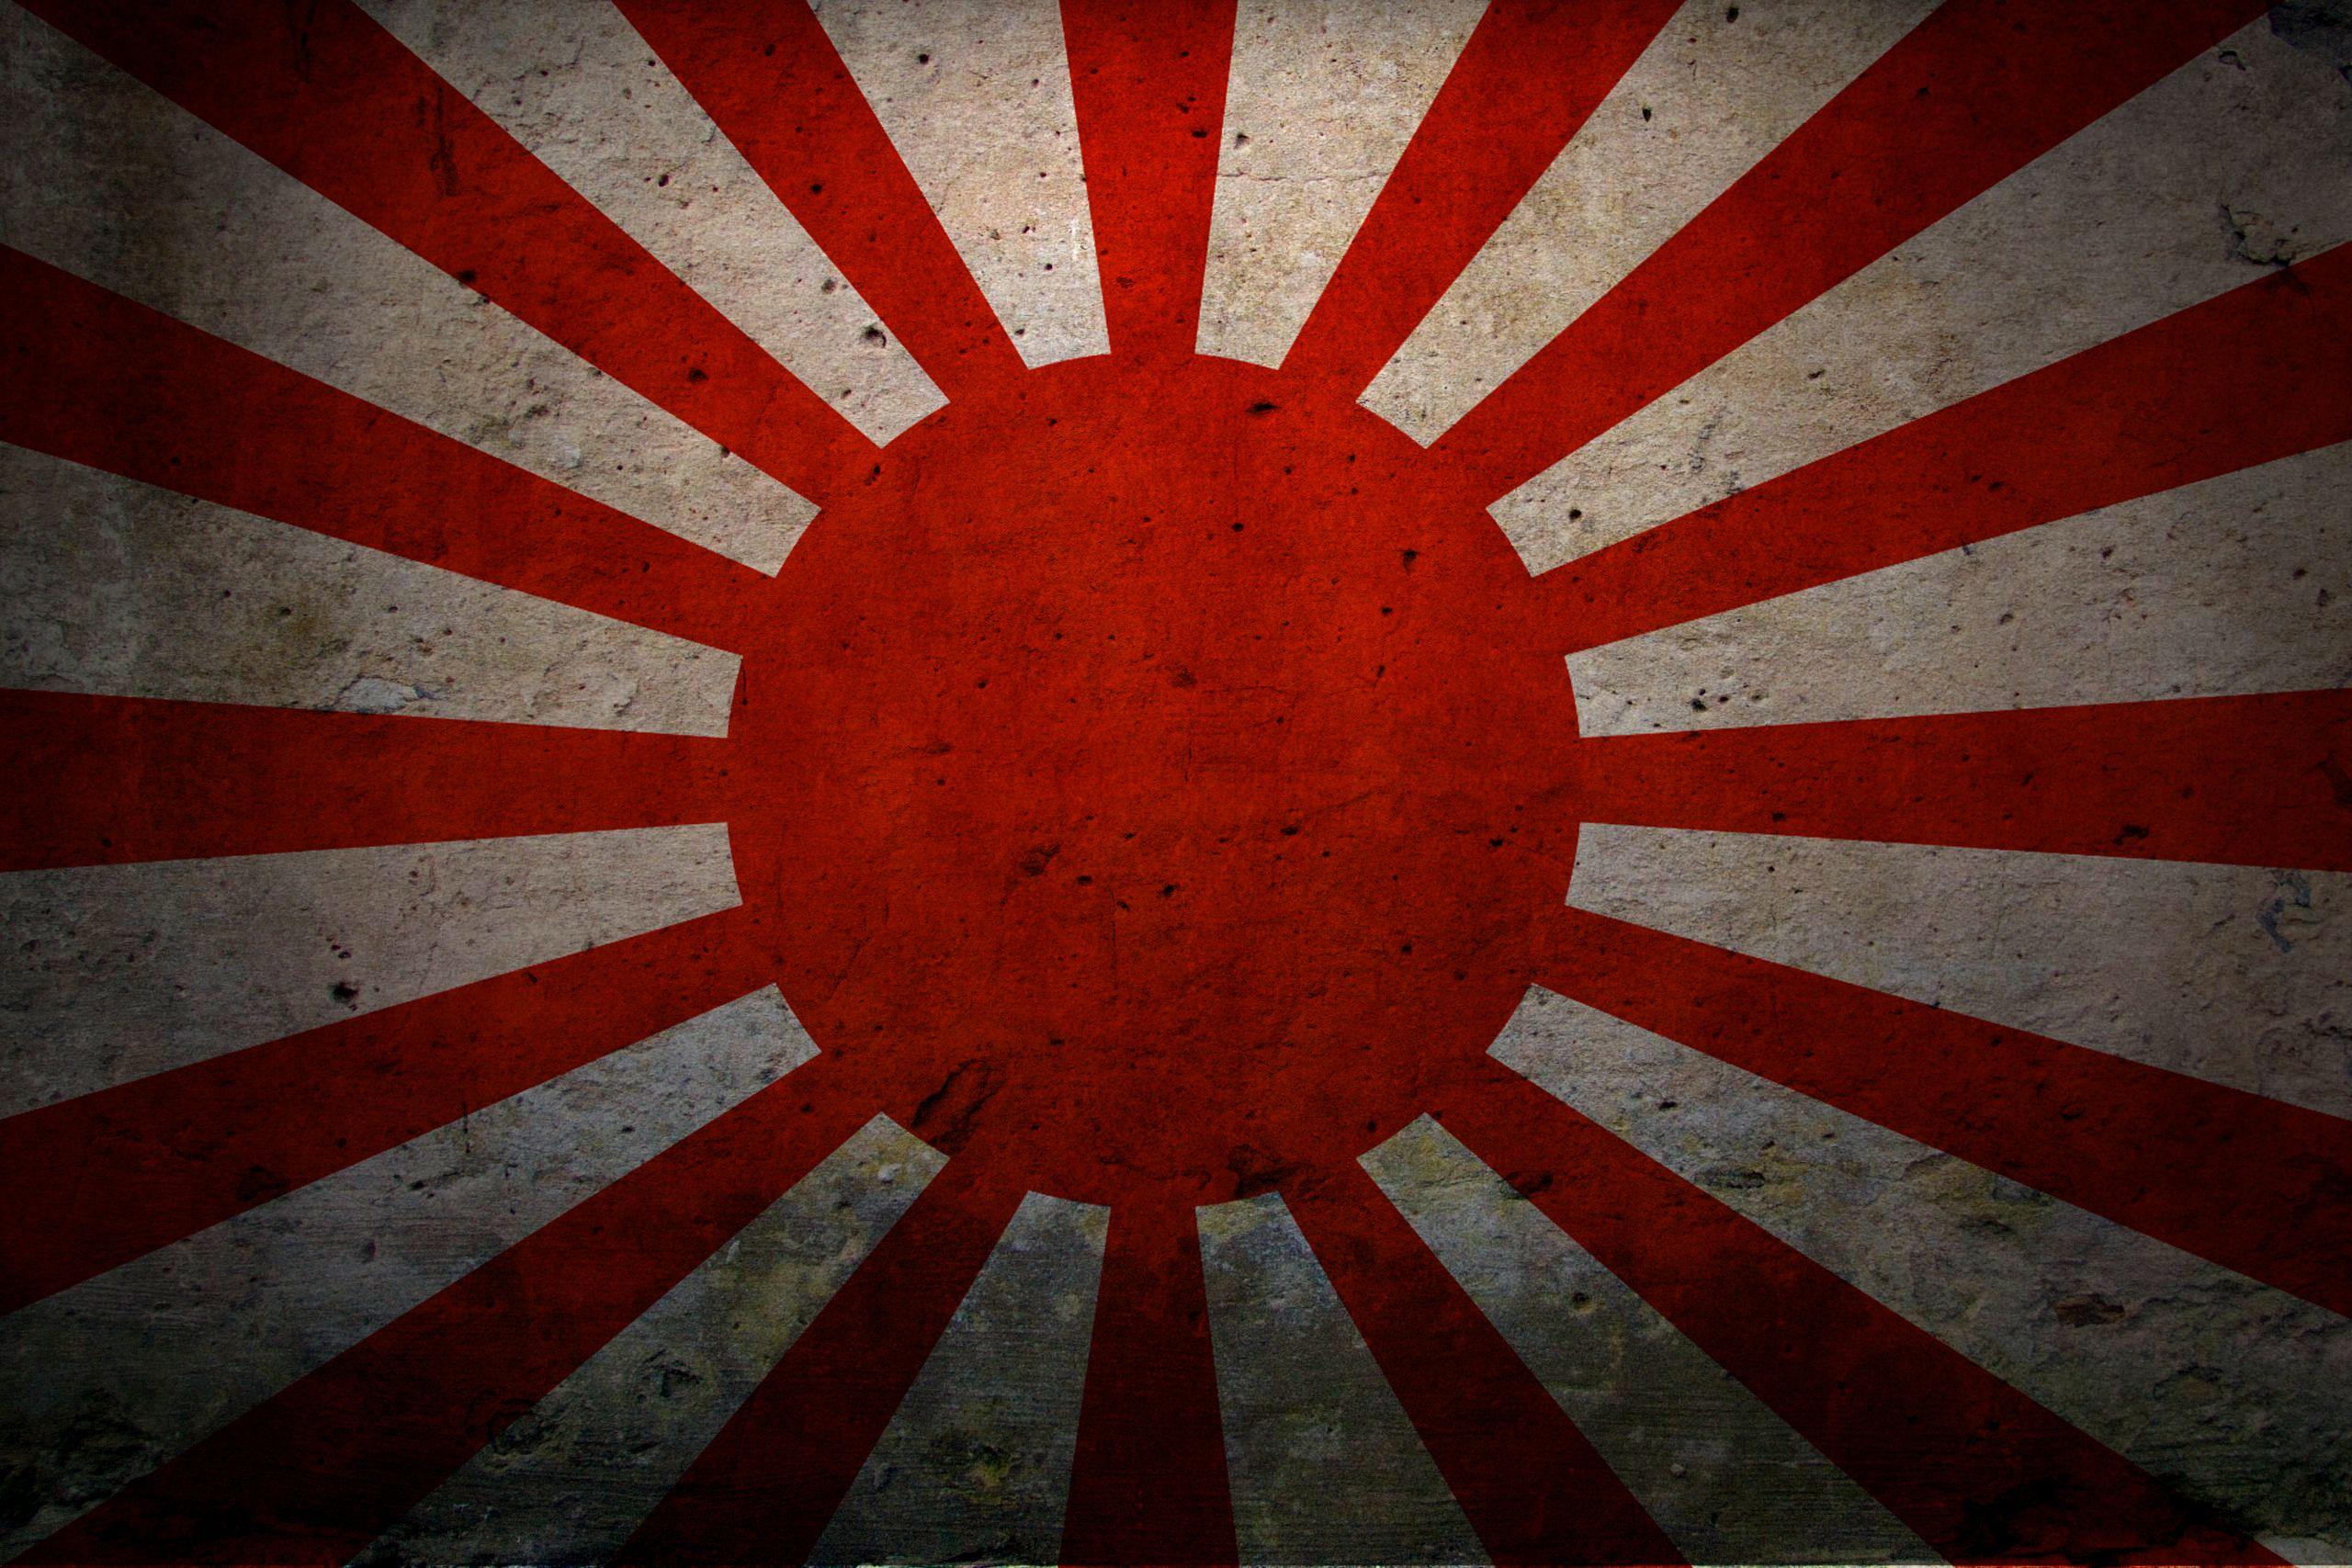 Pin By Matthew James On Desktops Symbols Products Japanese Flag Japanese Minimalism Japan Flag